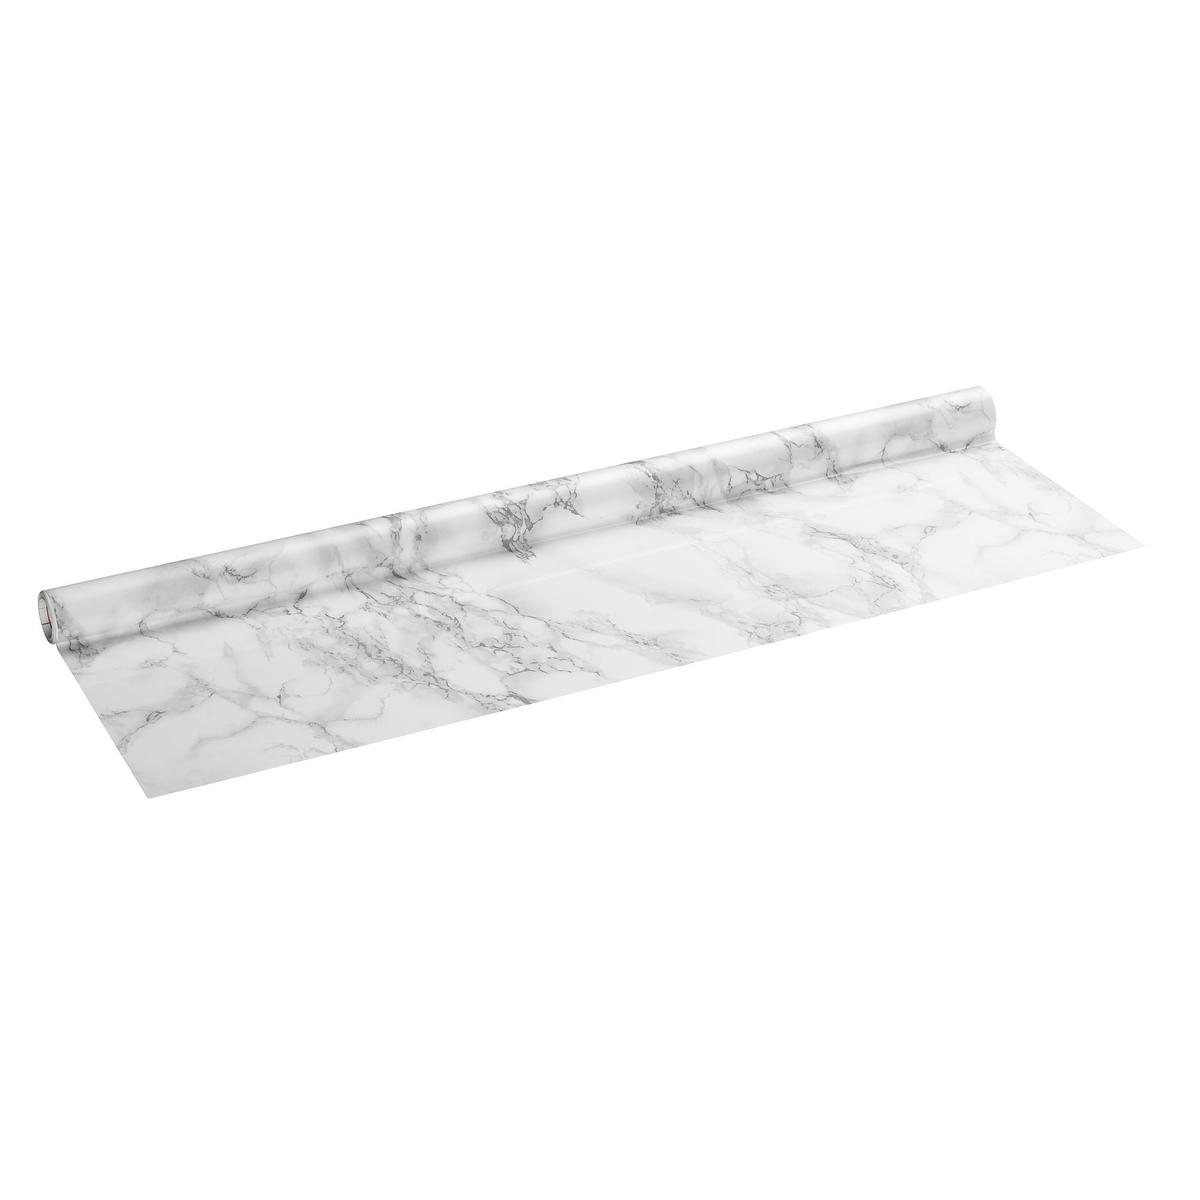 kontaktplast 67 5cm marmor vit. Black Bedroom Furniture Sets. Home Design Ideas